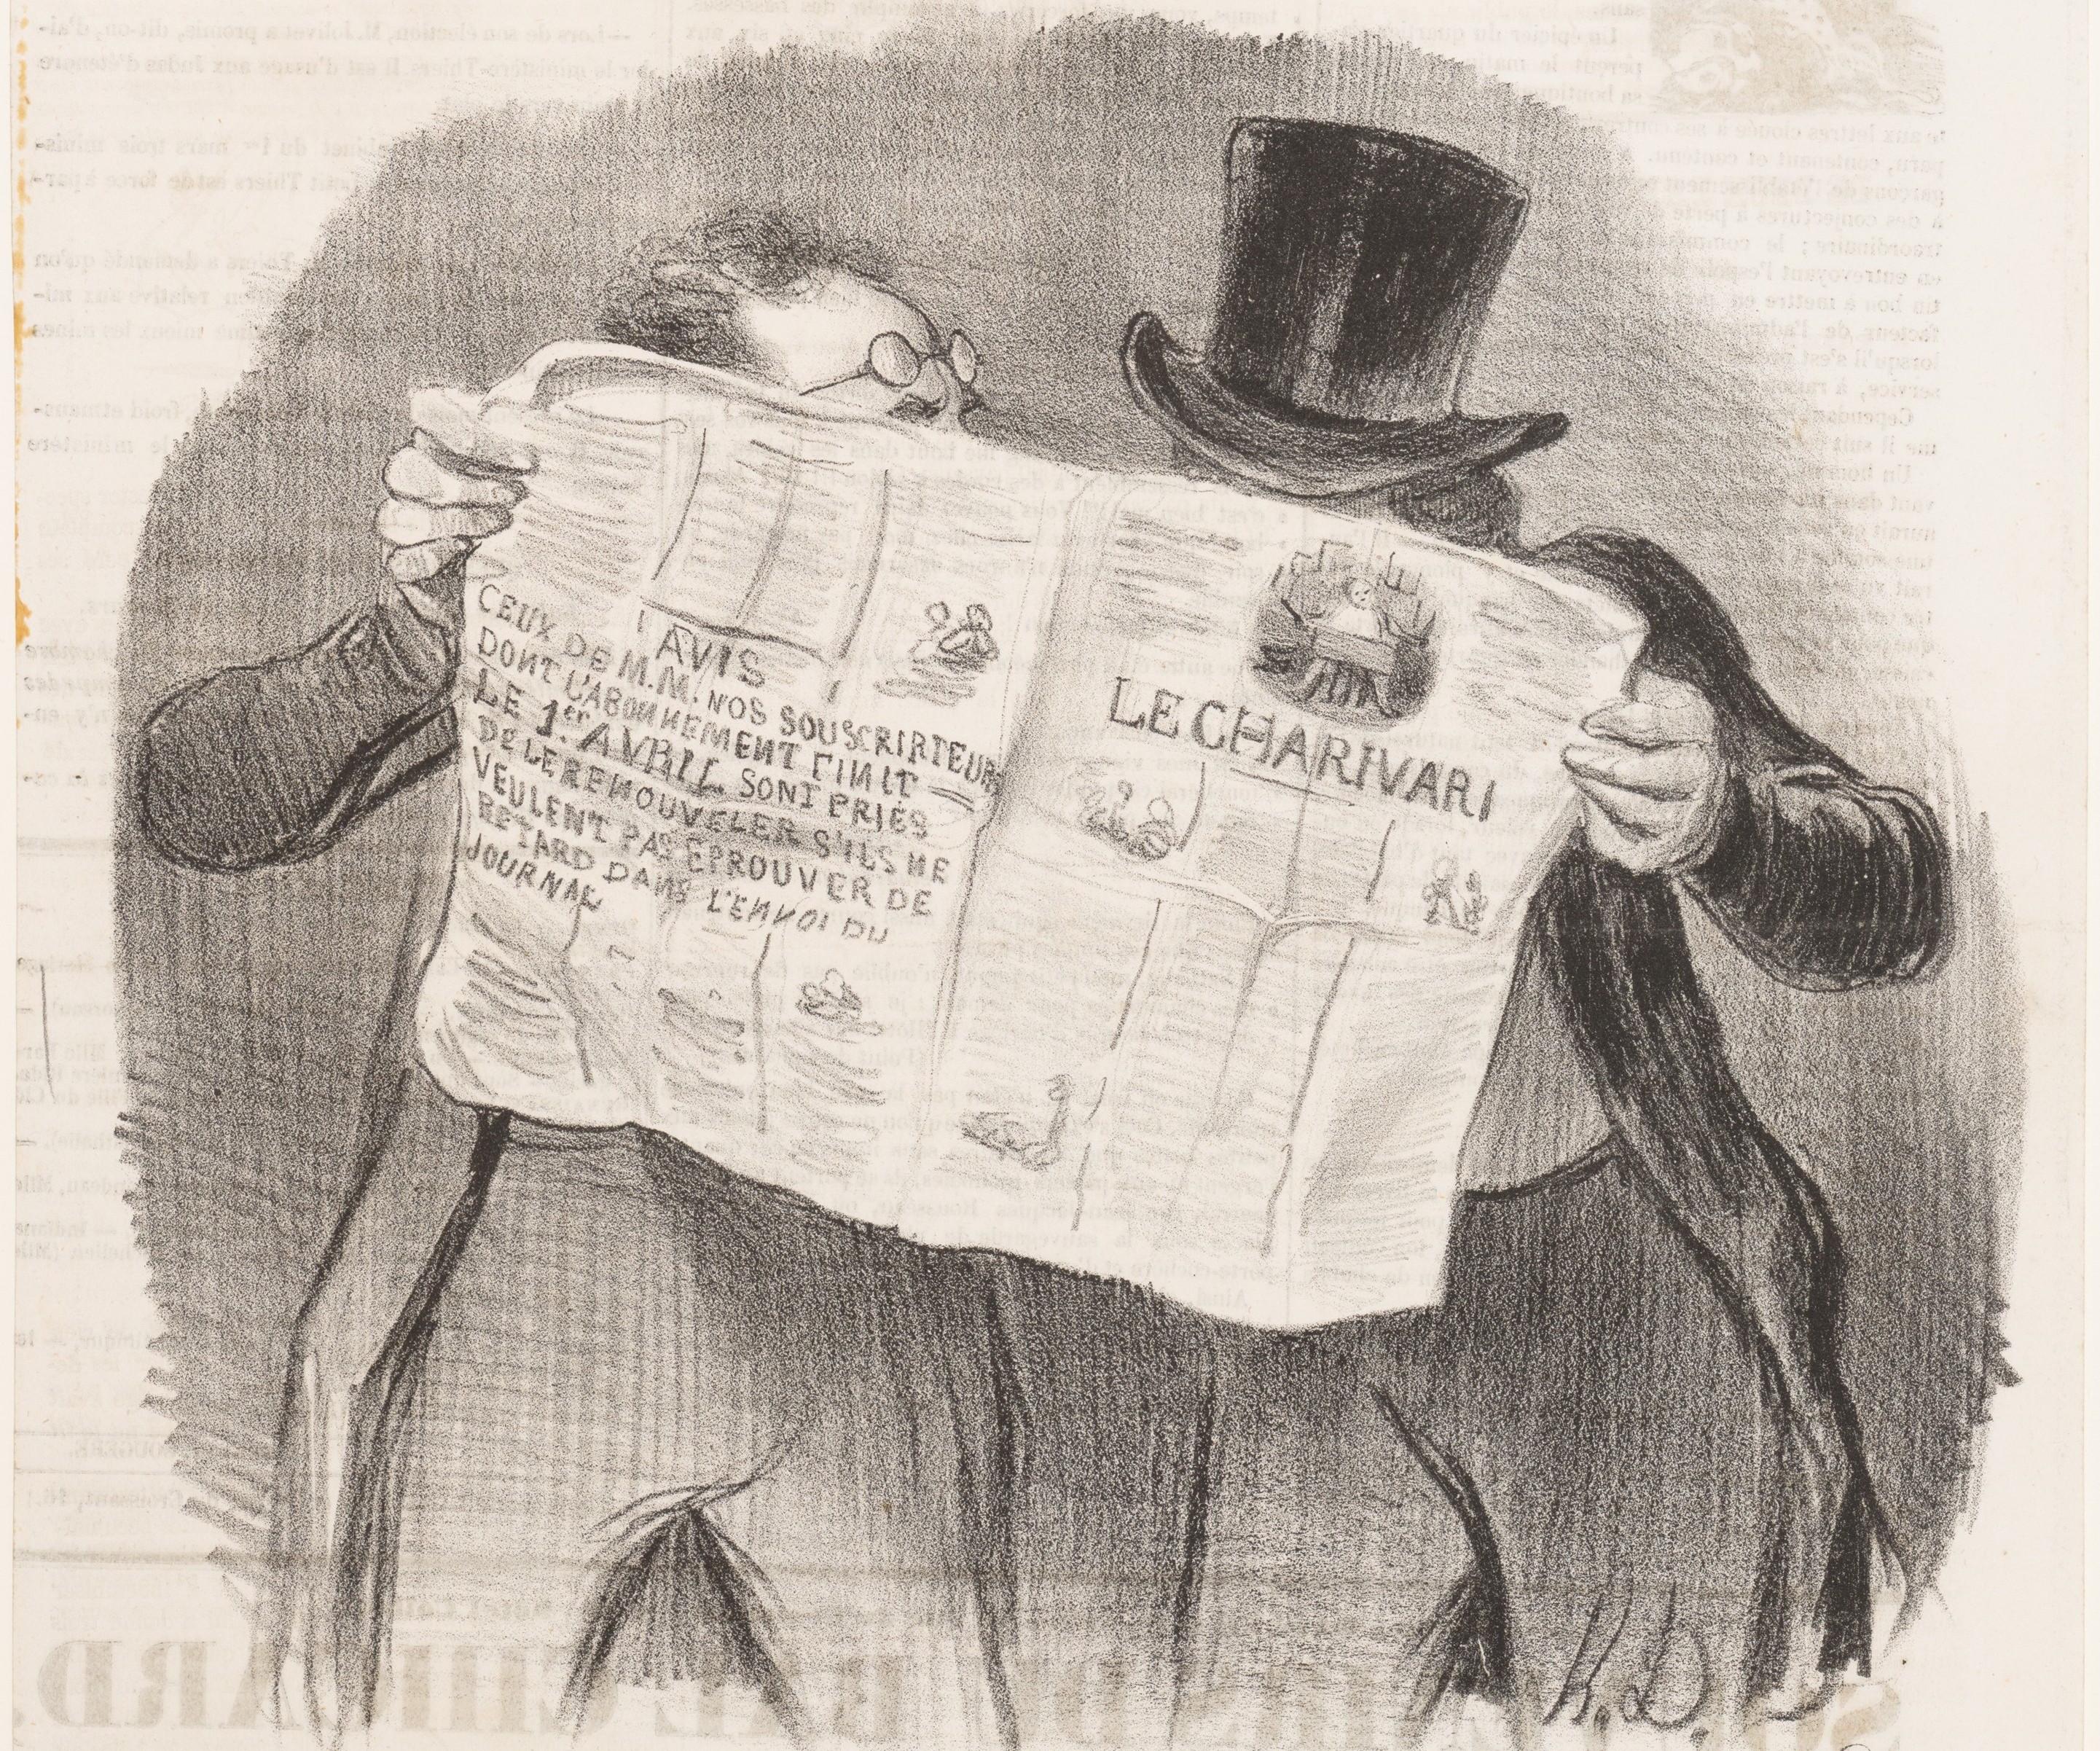 Honore_Daumier,_Le_Charivari_-_Advice_to_Subscribers,_1840